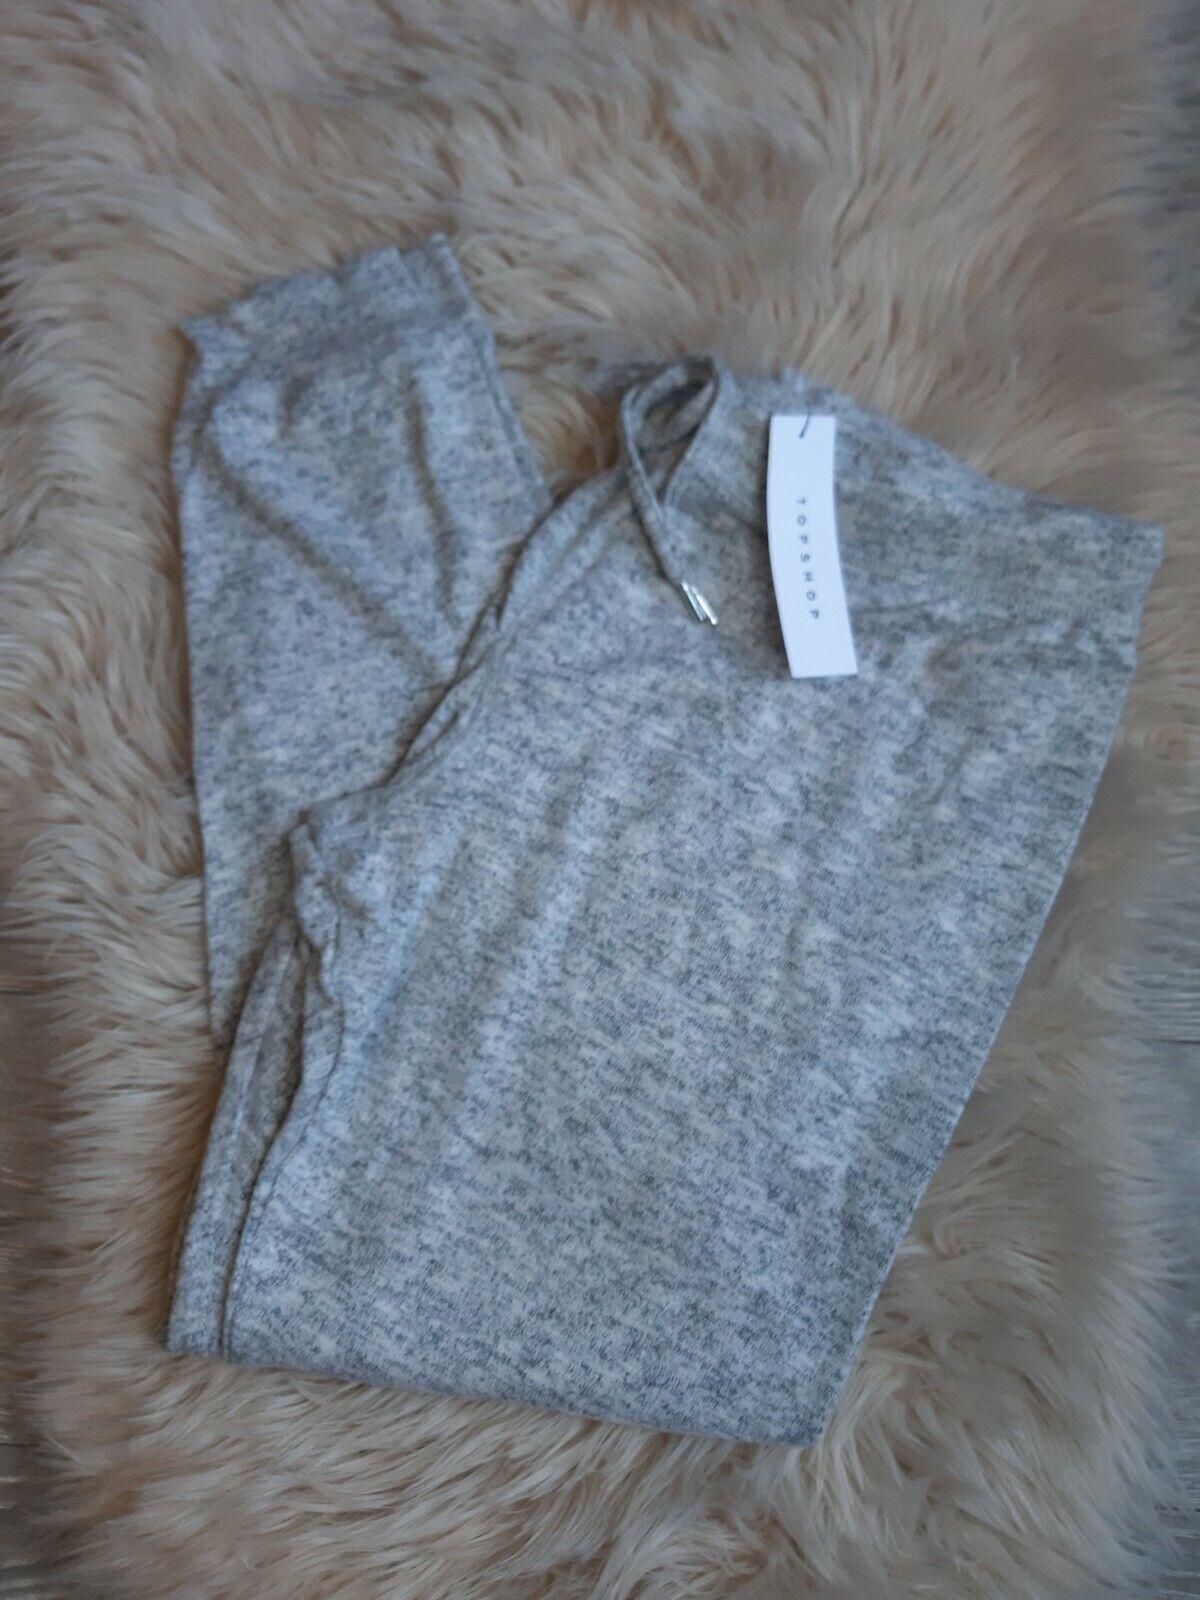 Topshop Womens Petite Grey Knitted Joggers Activewear Loungewear Bottoms UK18